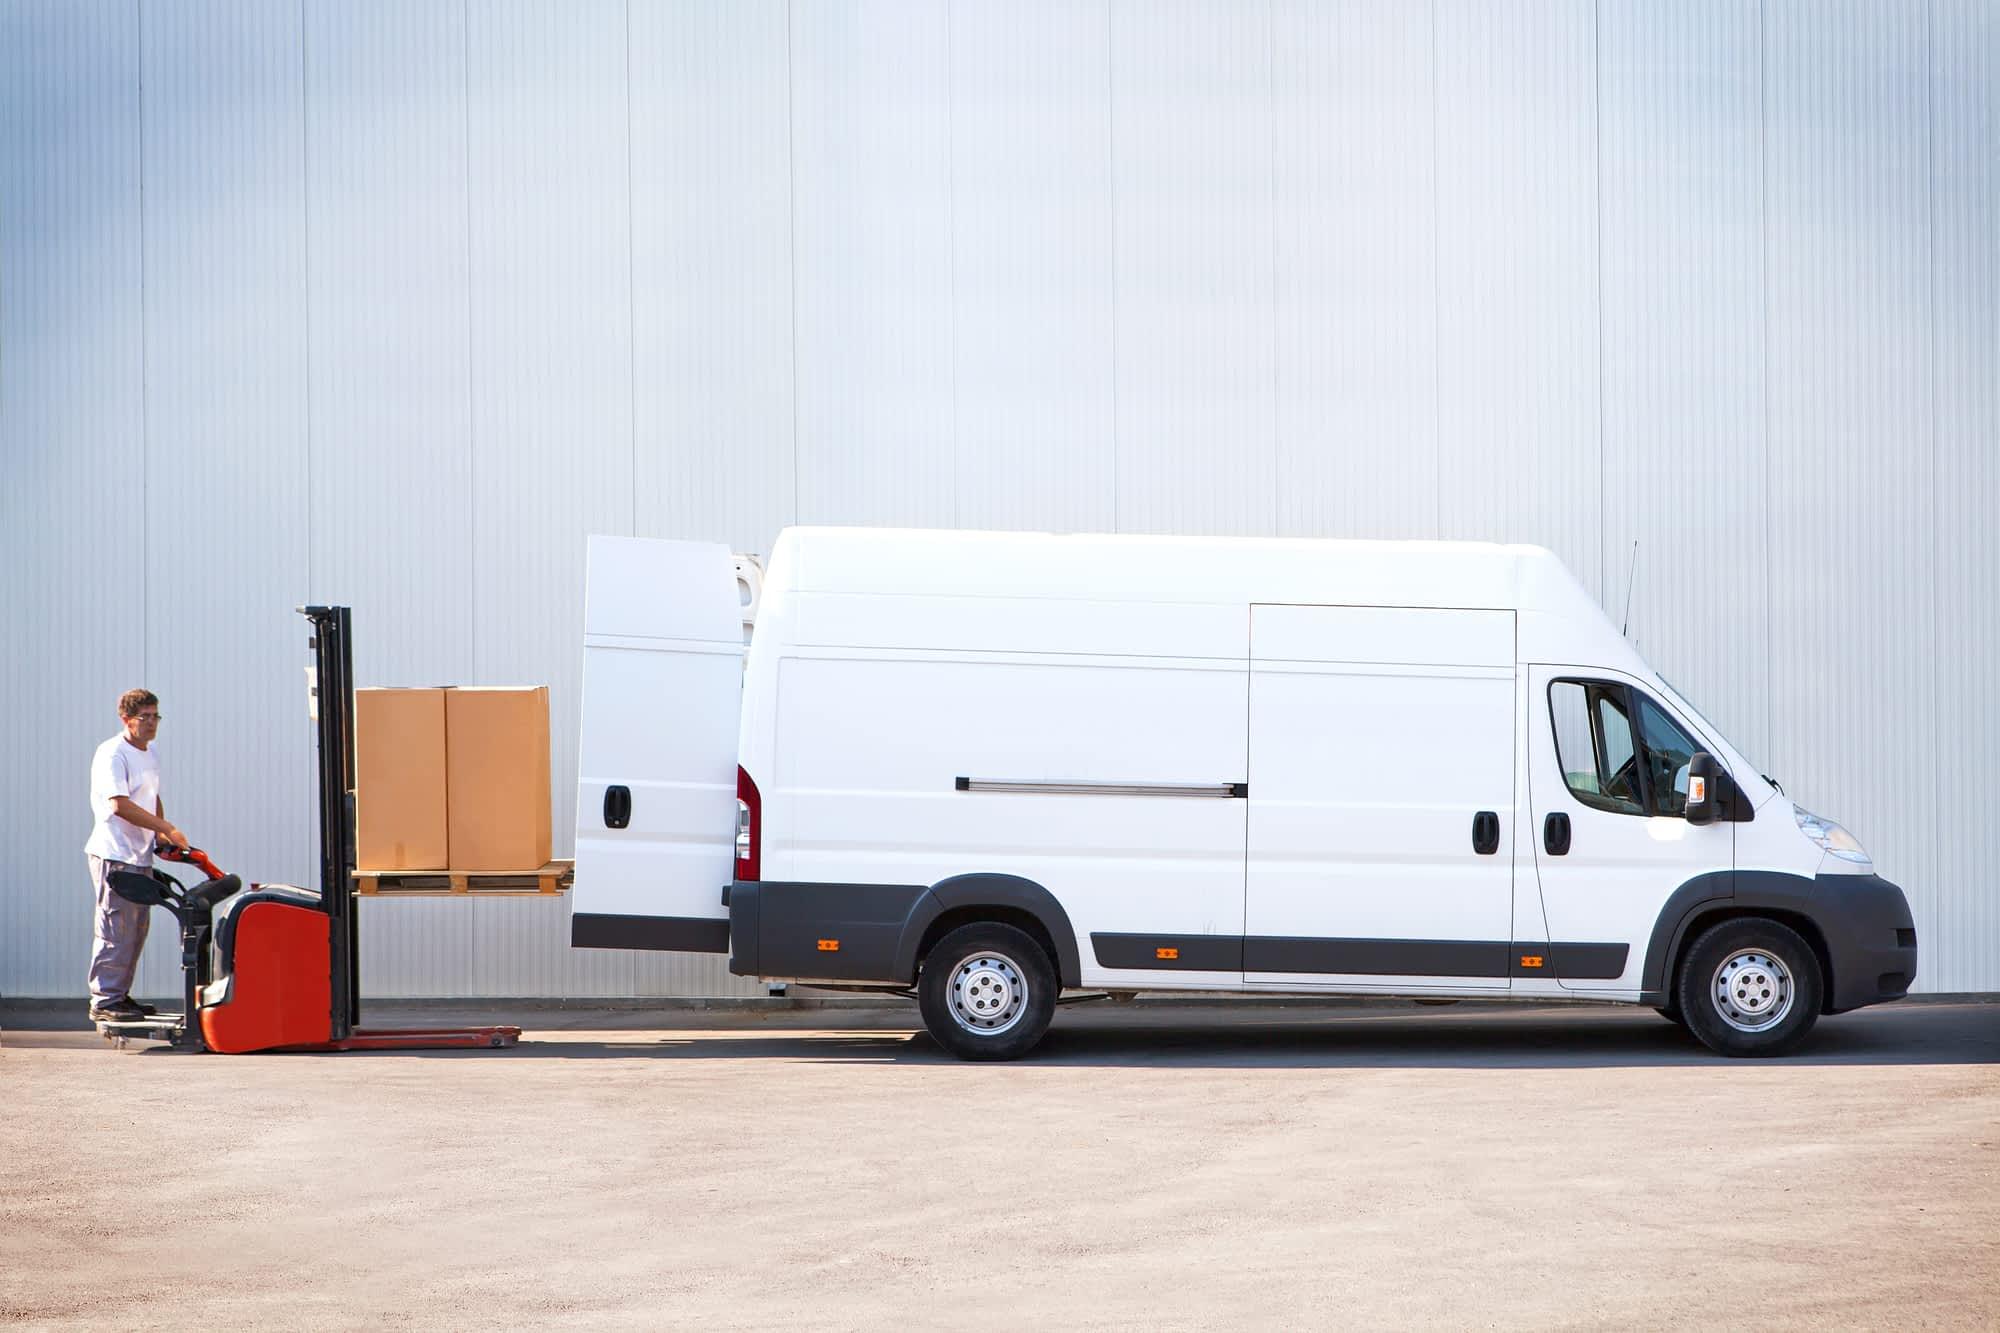 stride couriers loading van